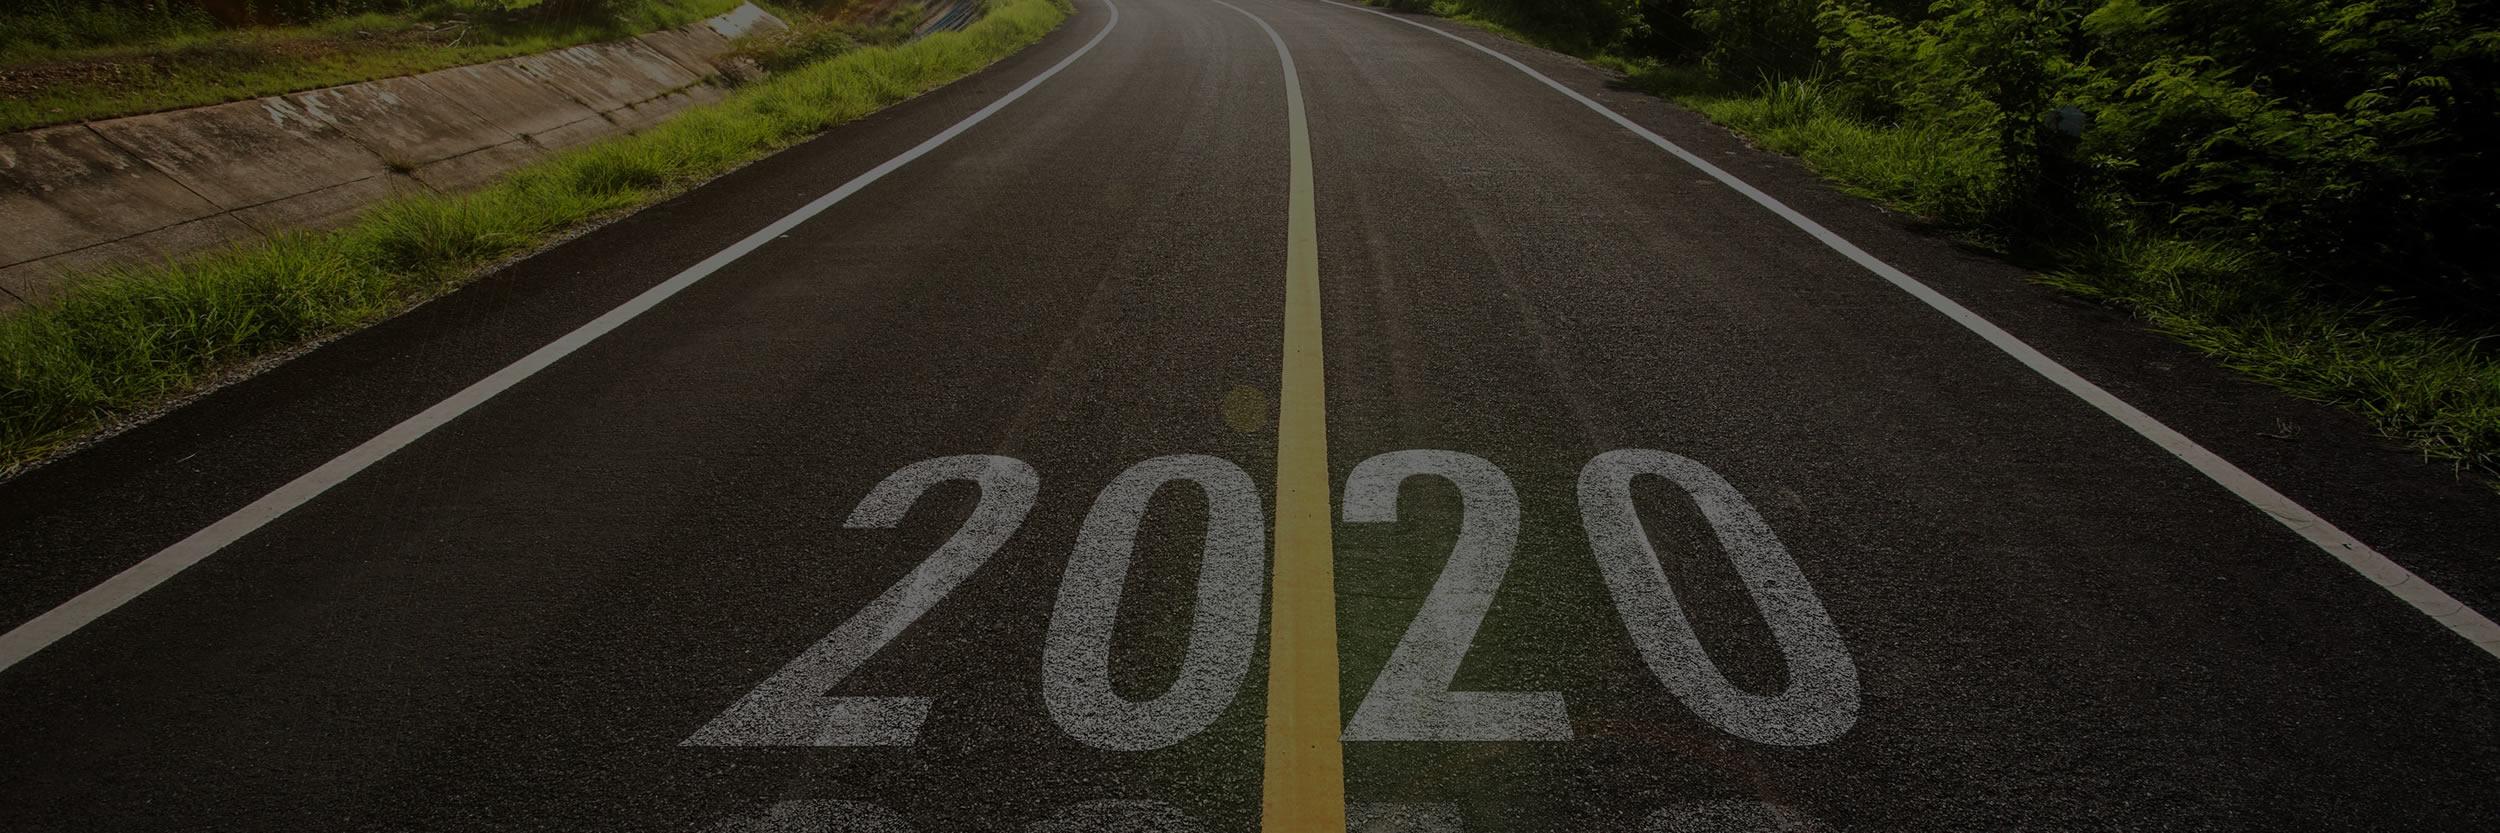 naem-webinar-2020-2020-ehs-and-sustainability-salary-webinar-1800x600